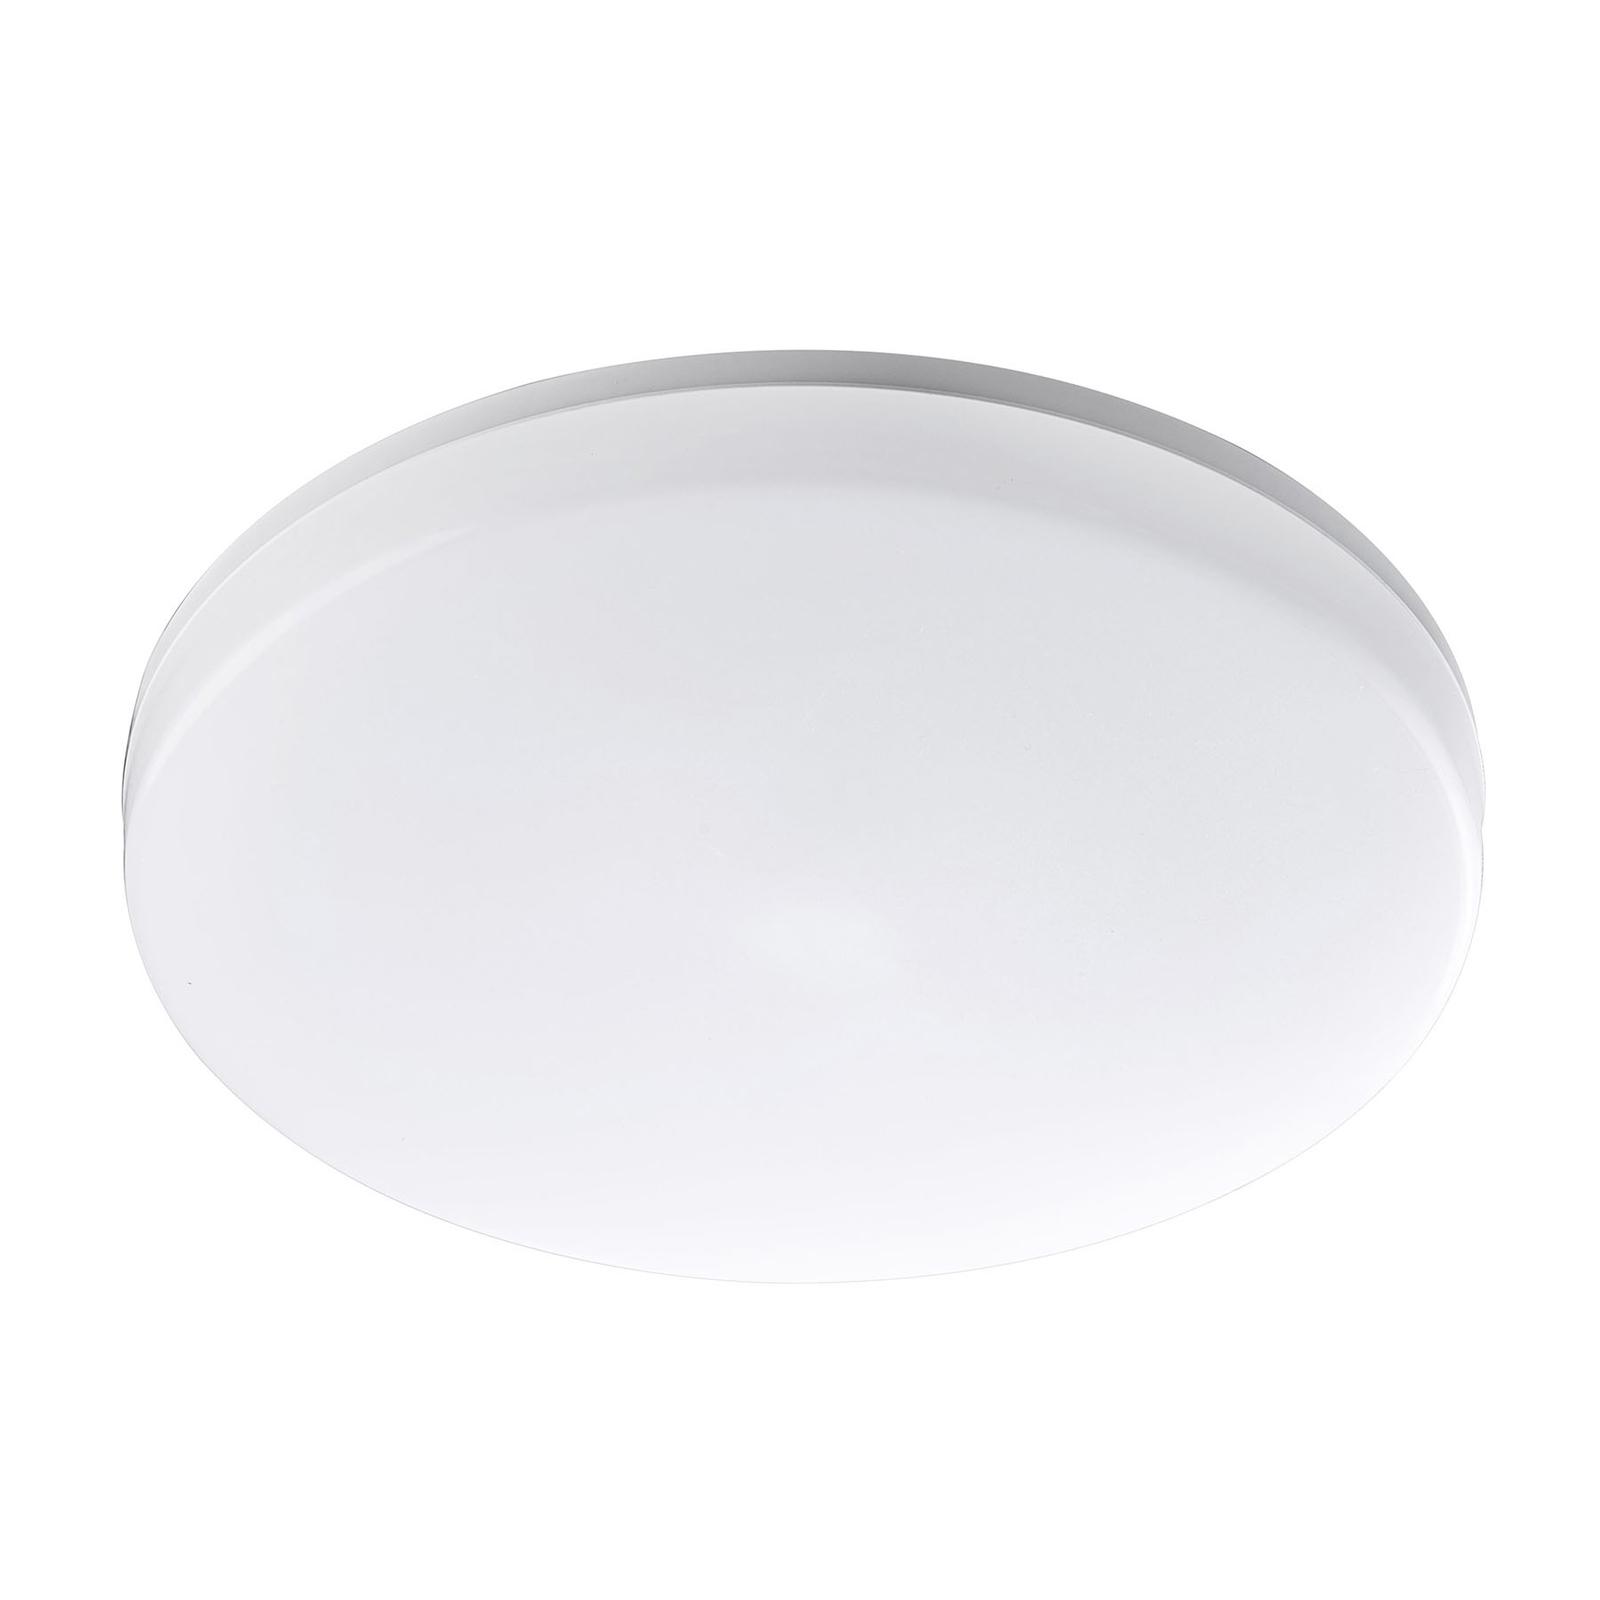 LED-Deckenleuchte Pronto, Ø 28 cm